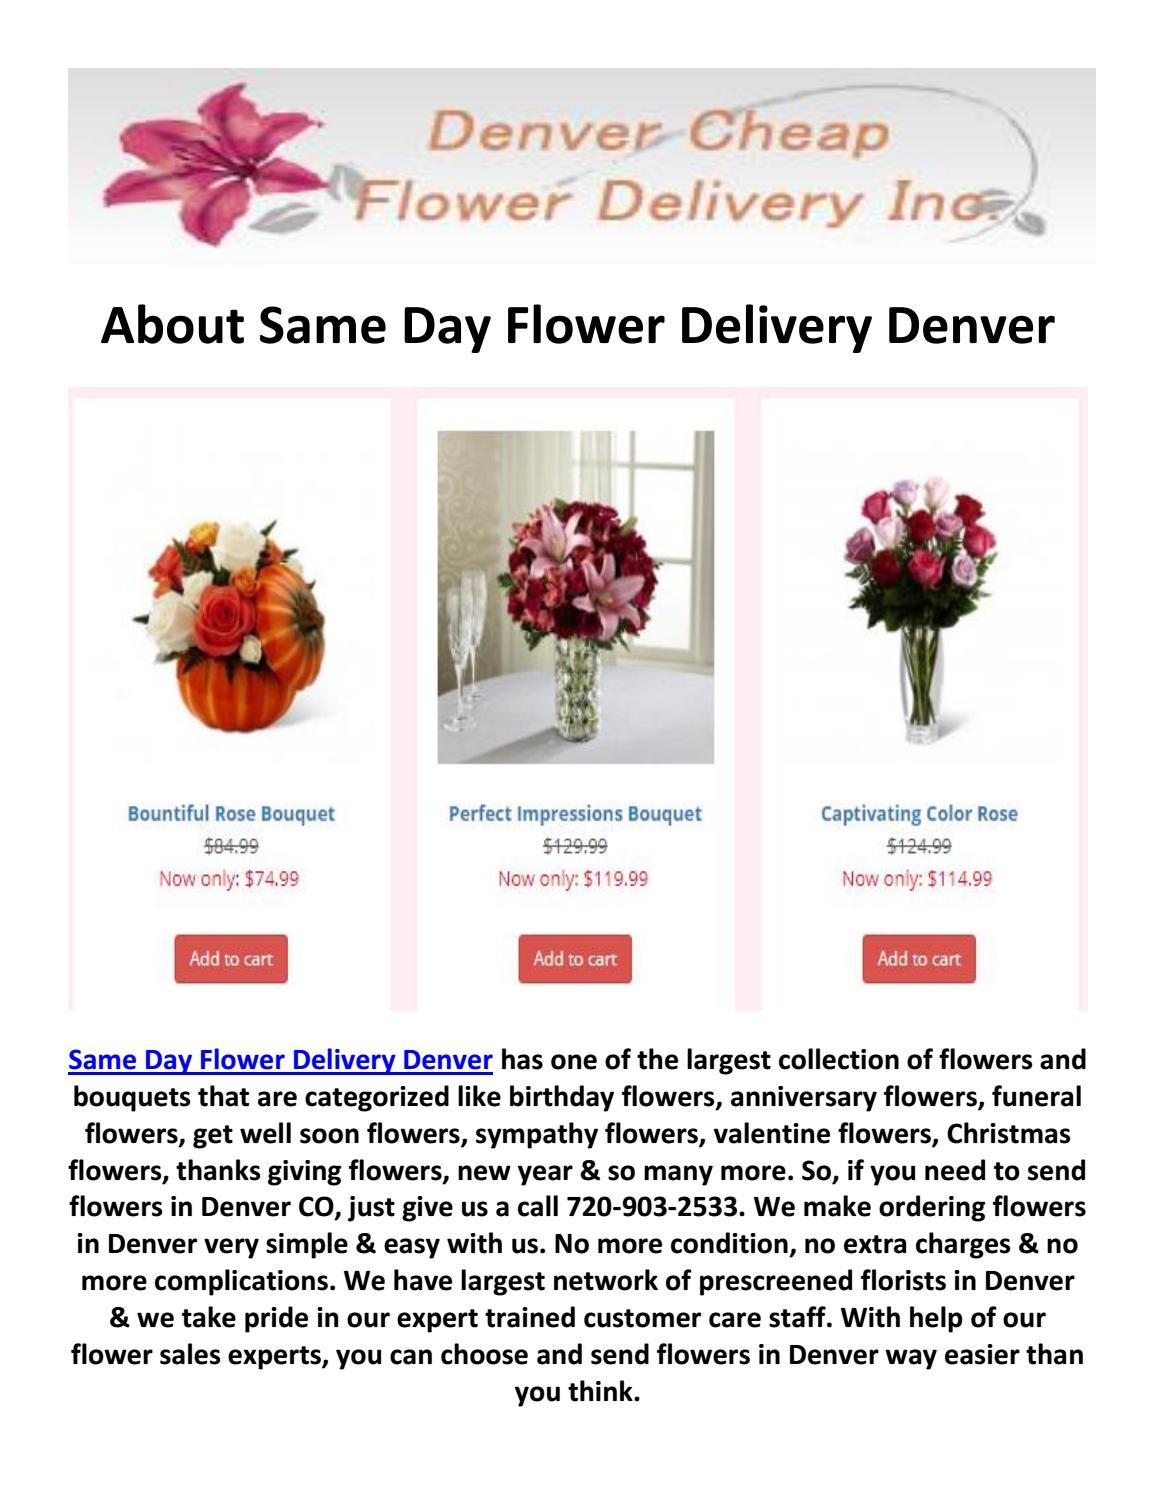 Same Day Flower Delivery Denver 720 903 2533 By Same Day Flower